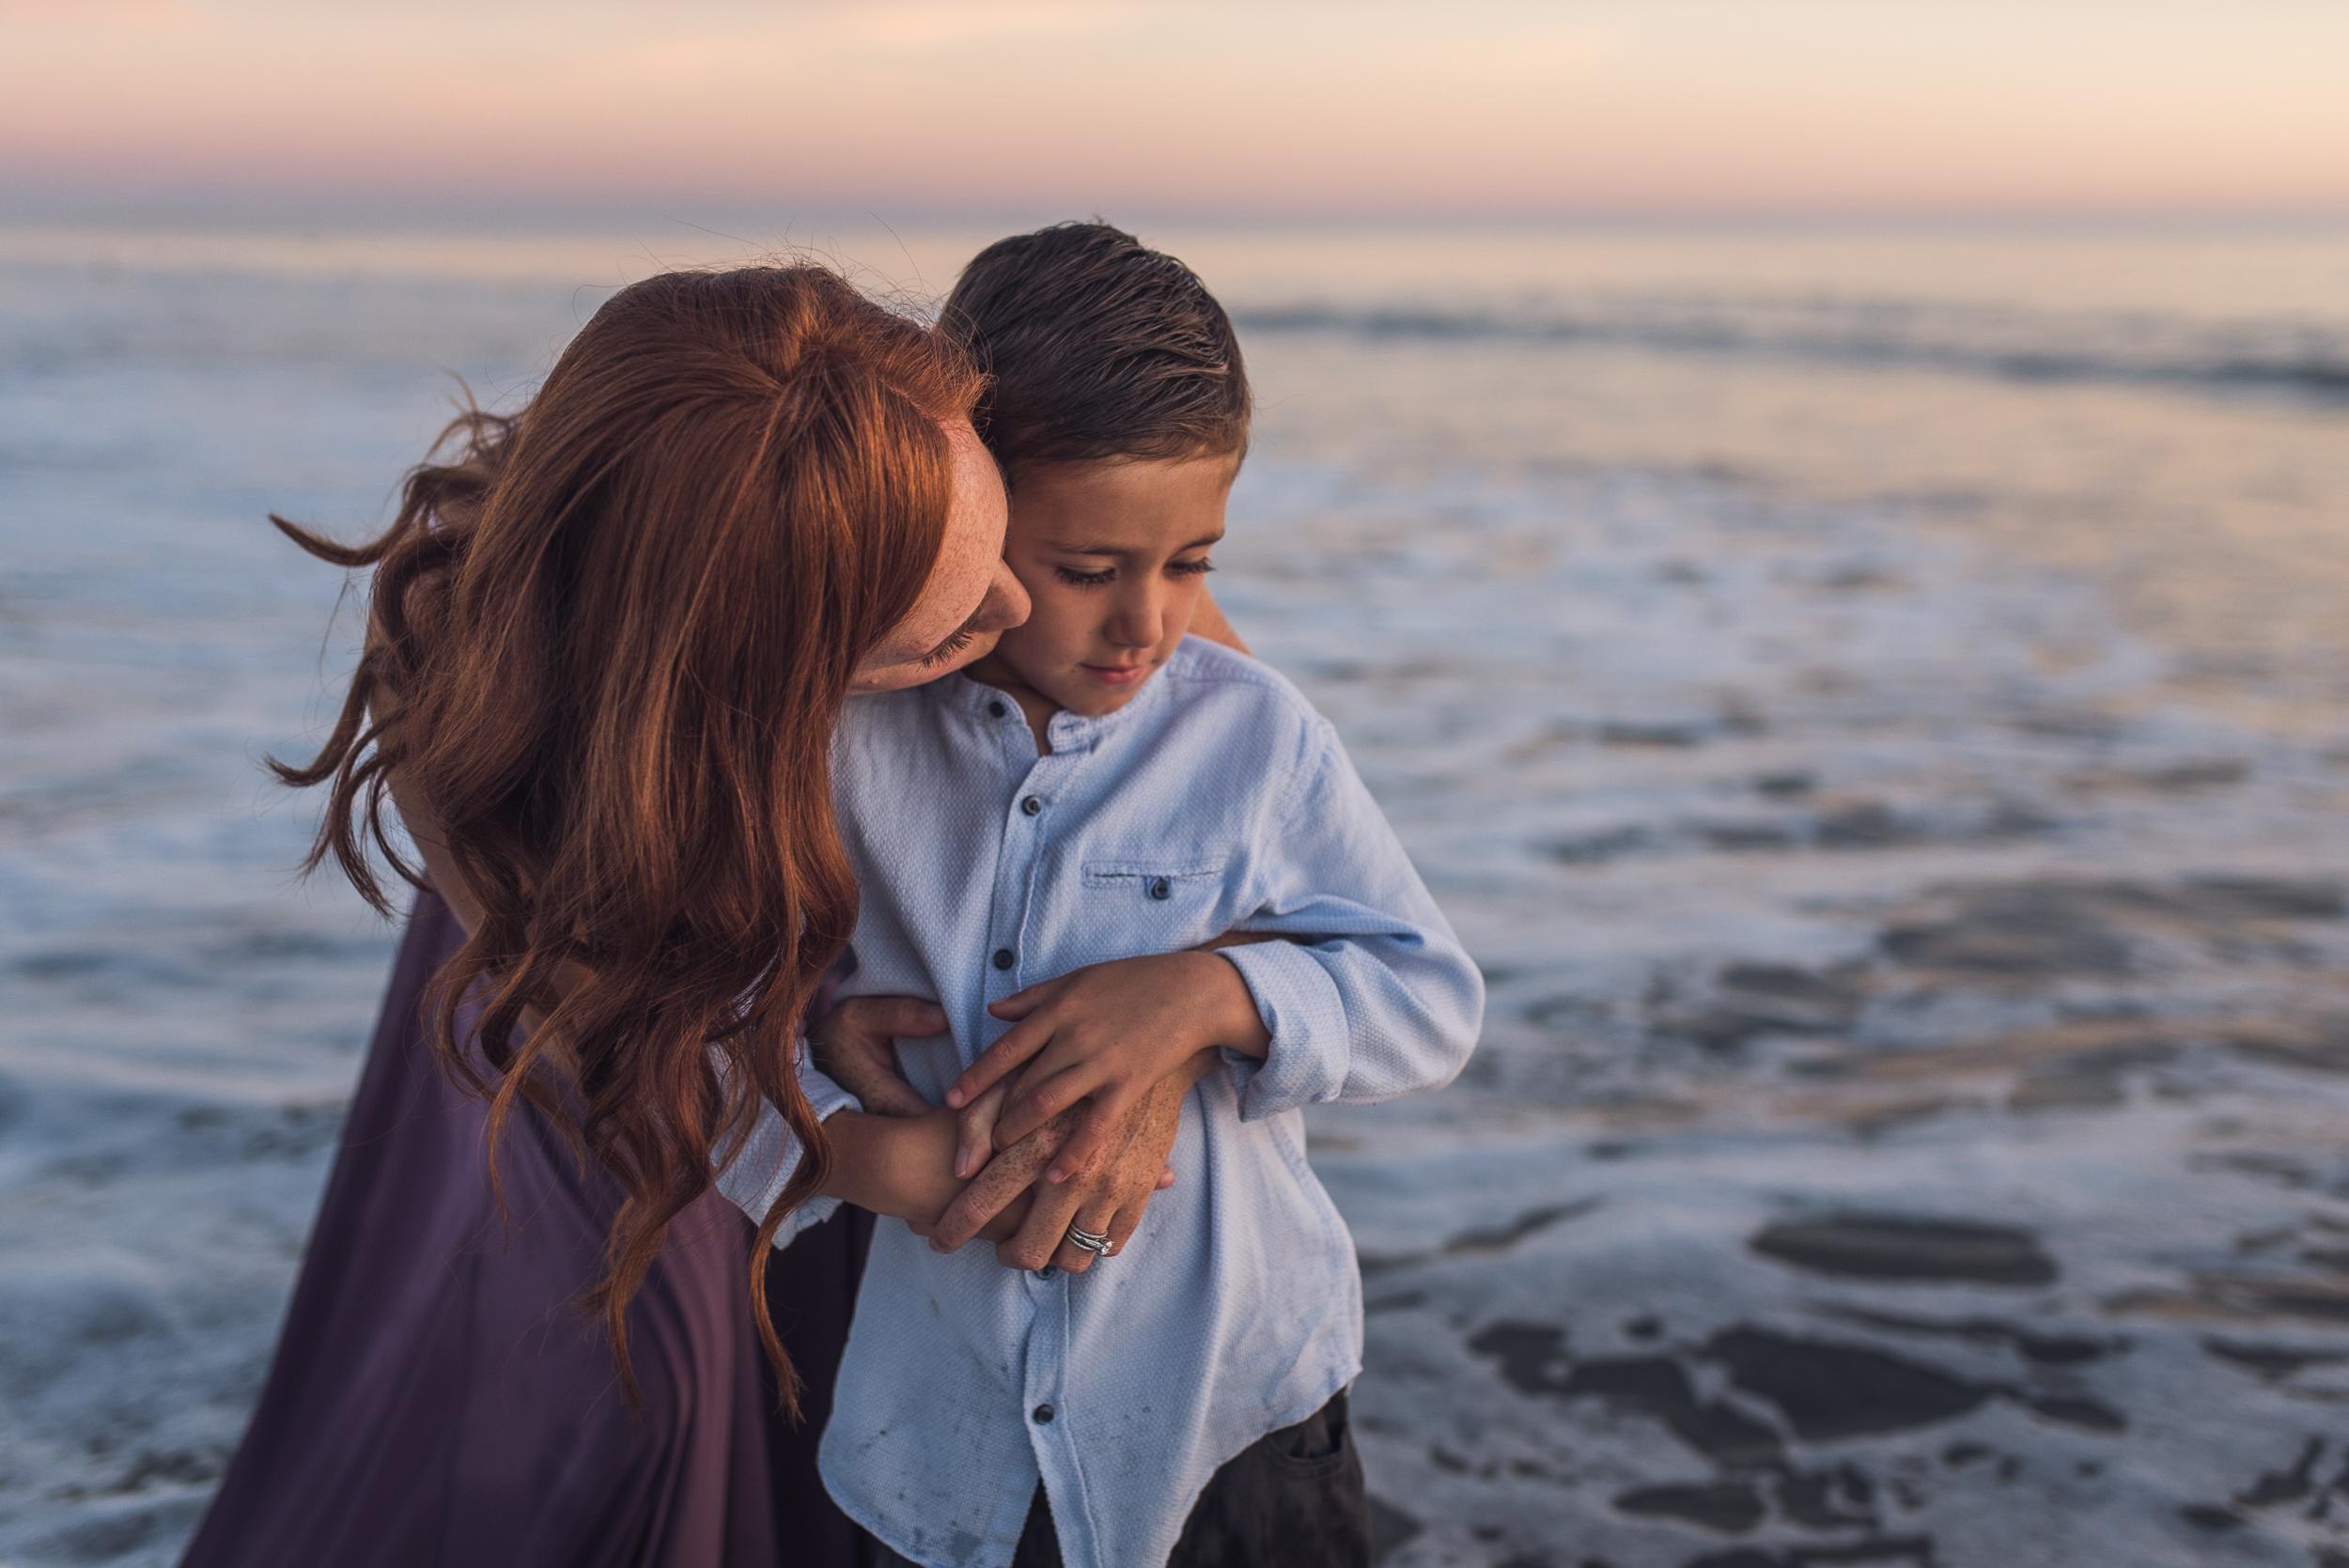 2018-San-Diego-Family-Lifestyle-Newborn-Travel-Vacation-Photographer-Kelsey-Smith-Photography-Coronado-La-Jolla-Encinitas-Solana-Beach-Del-Mar-208.jpg